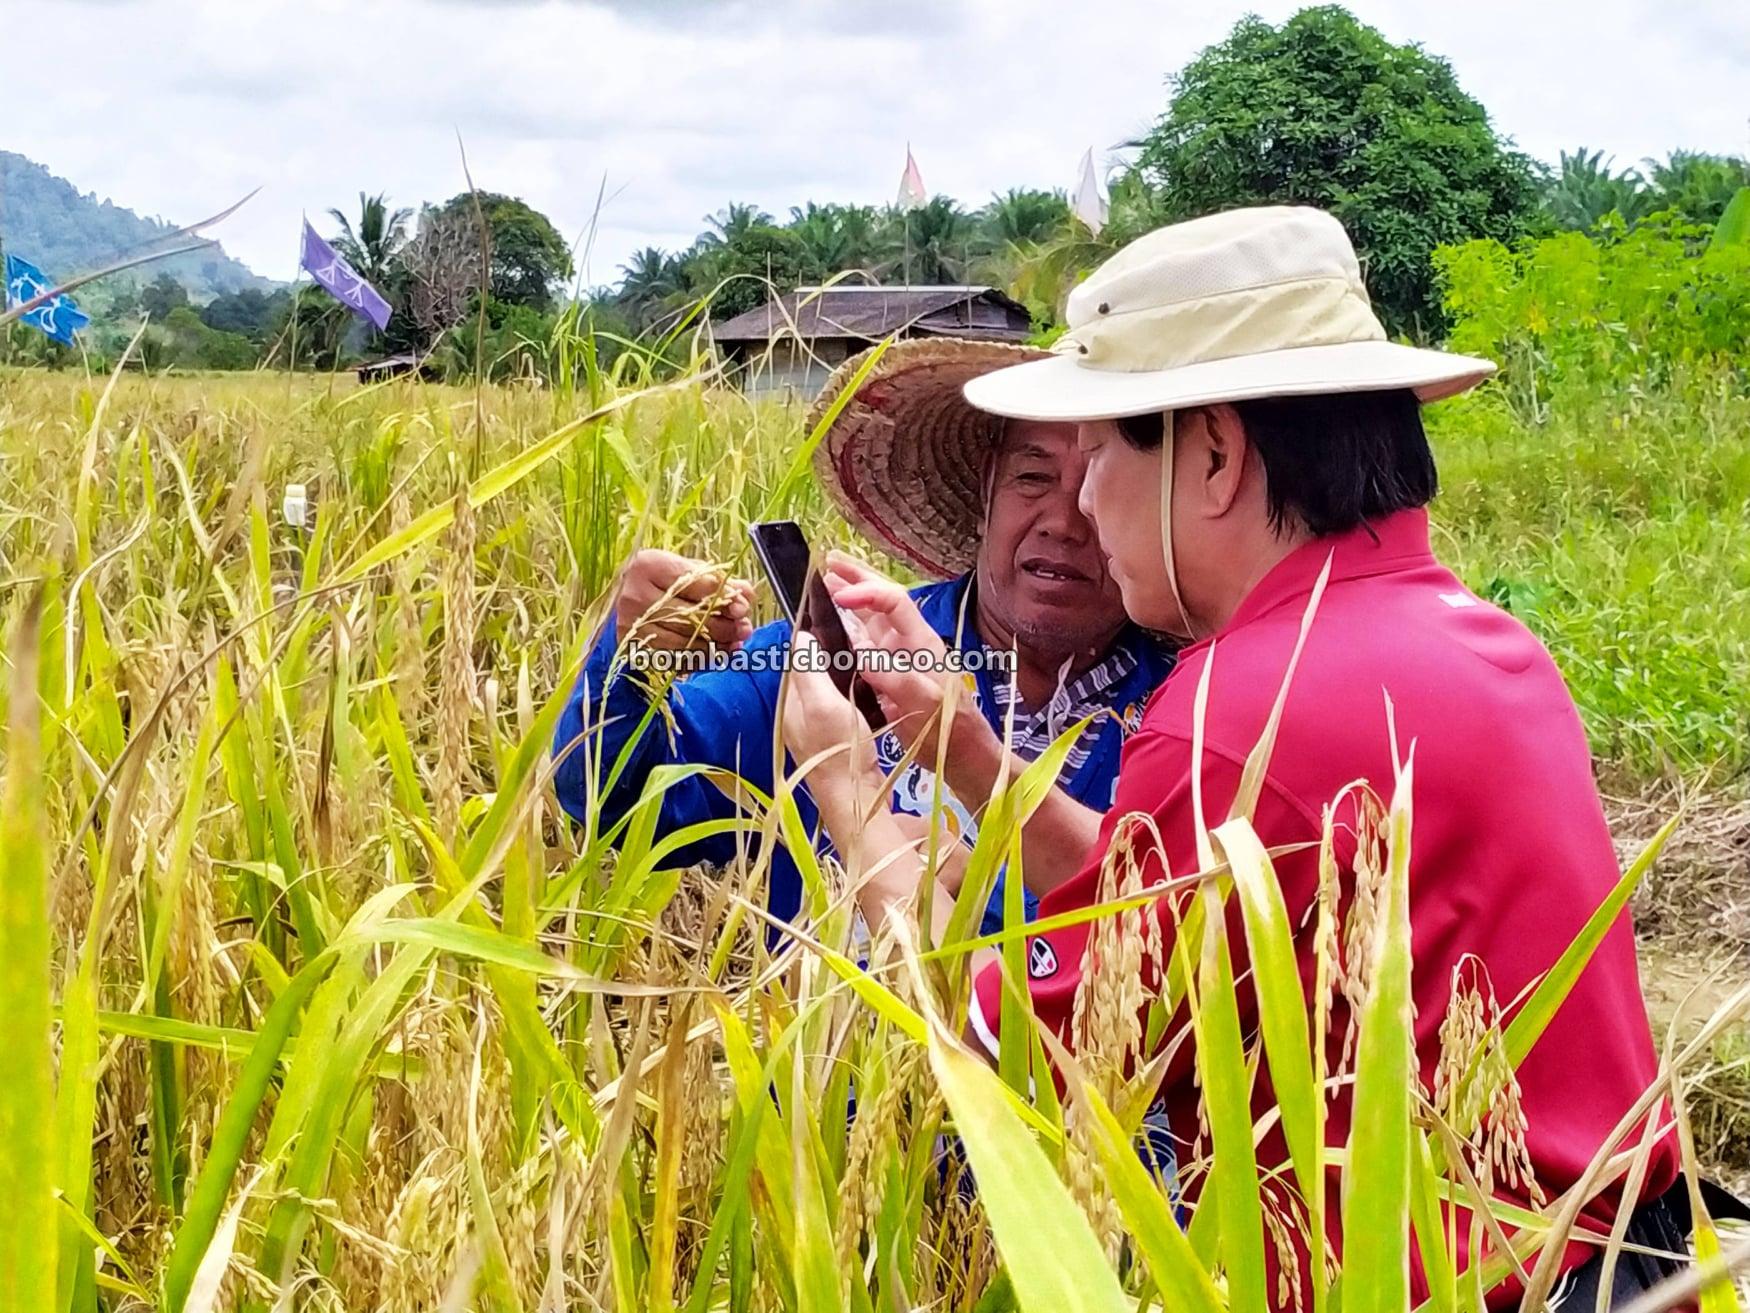 Bunan Gega Village, Paddy Farming, Paddy harvesting, Sawah Padi, Dayak Bidayuh, authentic, traditional, exploration, Malaysia, Tourist attraction, travel guide, Borneo, 马来西亚砂拉越, 西连比达友稻田, 婆罗洲稻米之乡